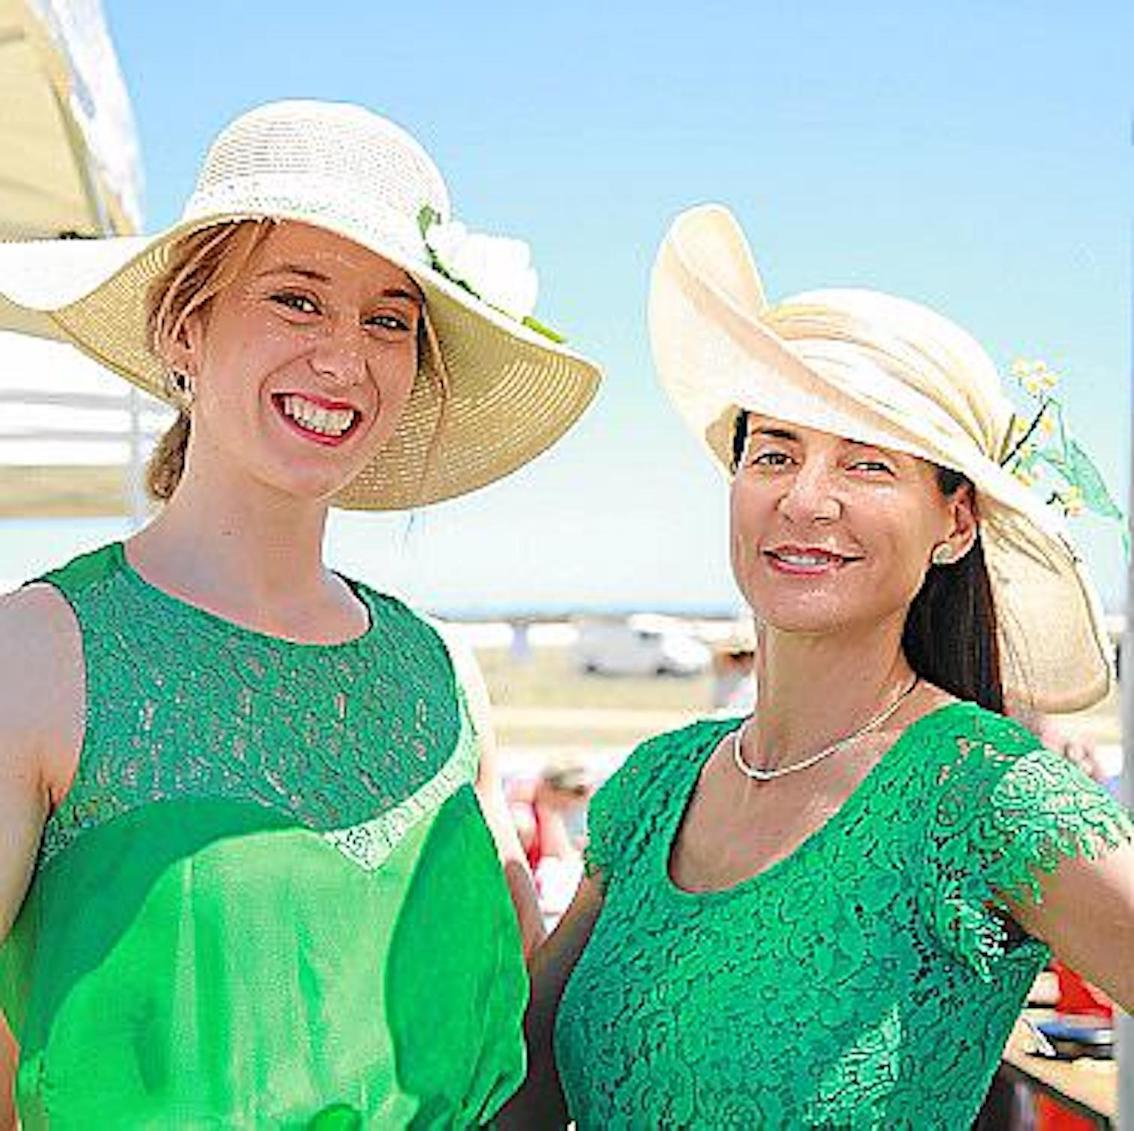 Luciana Pons & friend at Hats & Horses, Minorca.